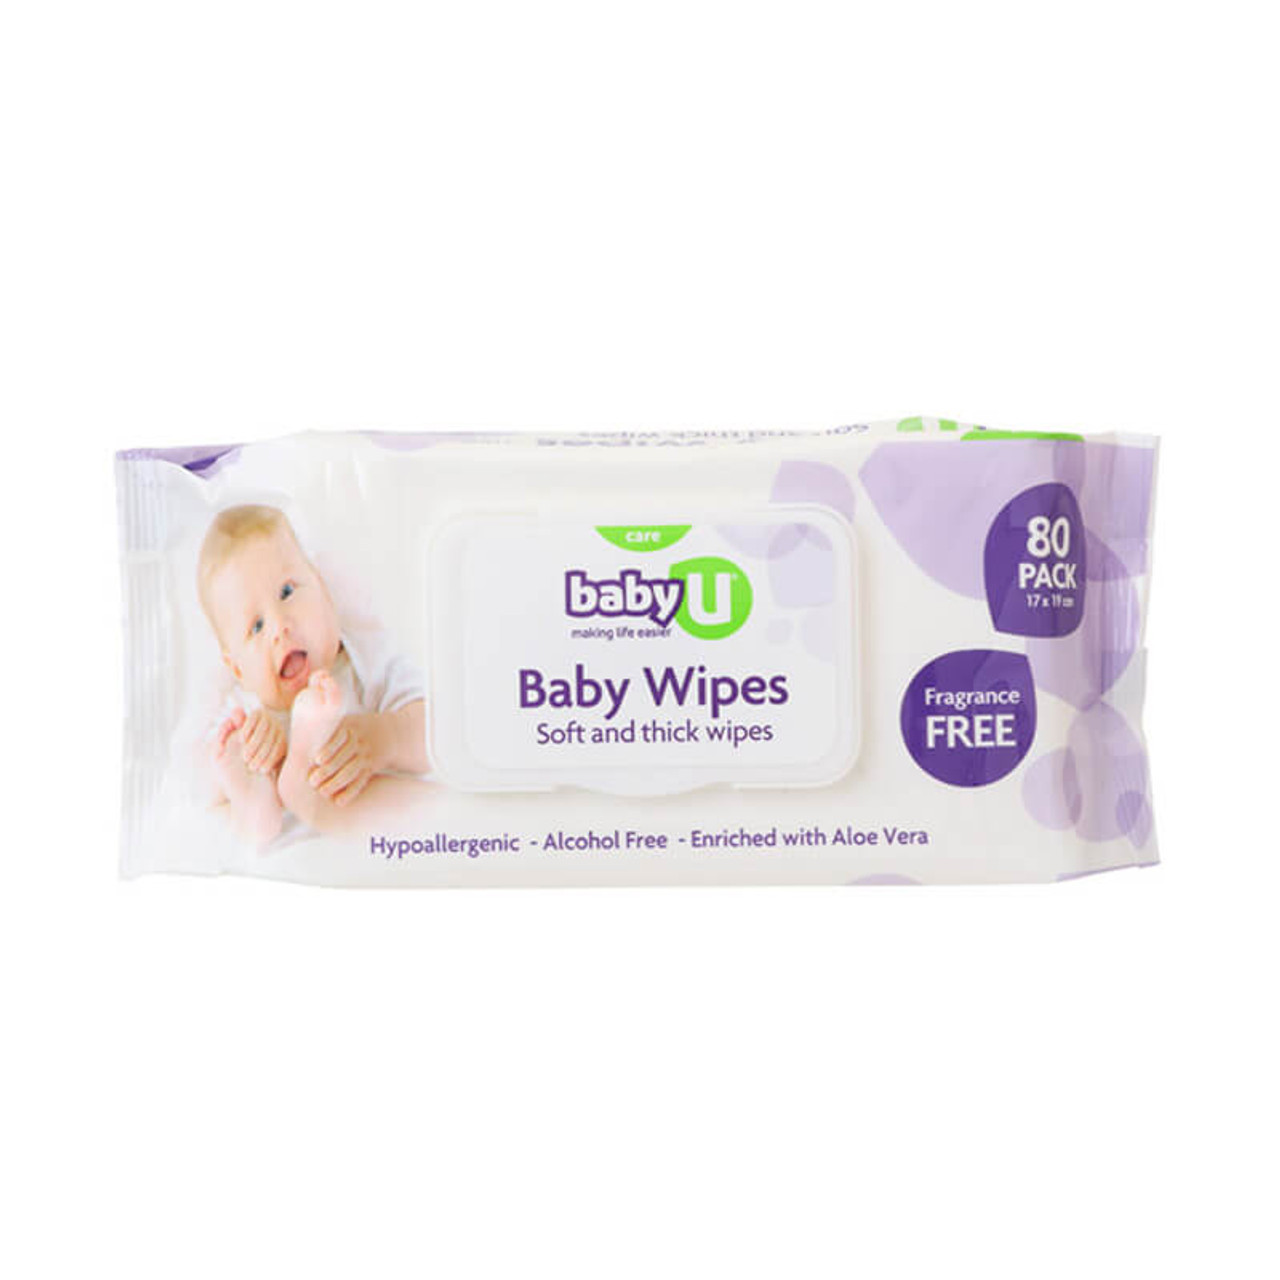 Baby U Baby Wipes Fragrance Free 80pk